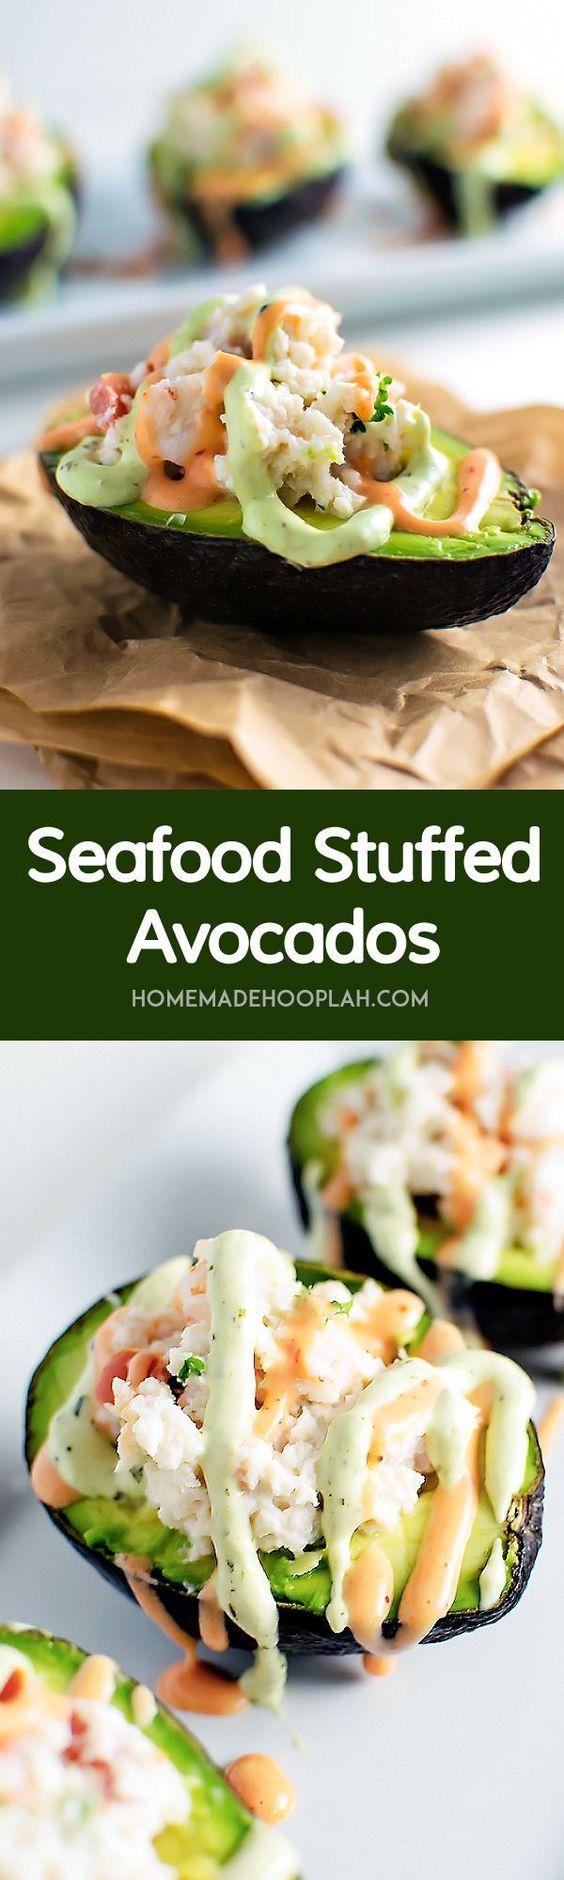 Seafood Stuffed Avocados - #Ketogenic #KetogenicDiet #Ketosis #LCHF #LowCarb #Keto #Paleo #Atkins #Primal